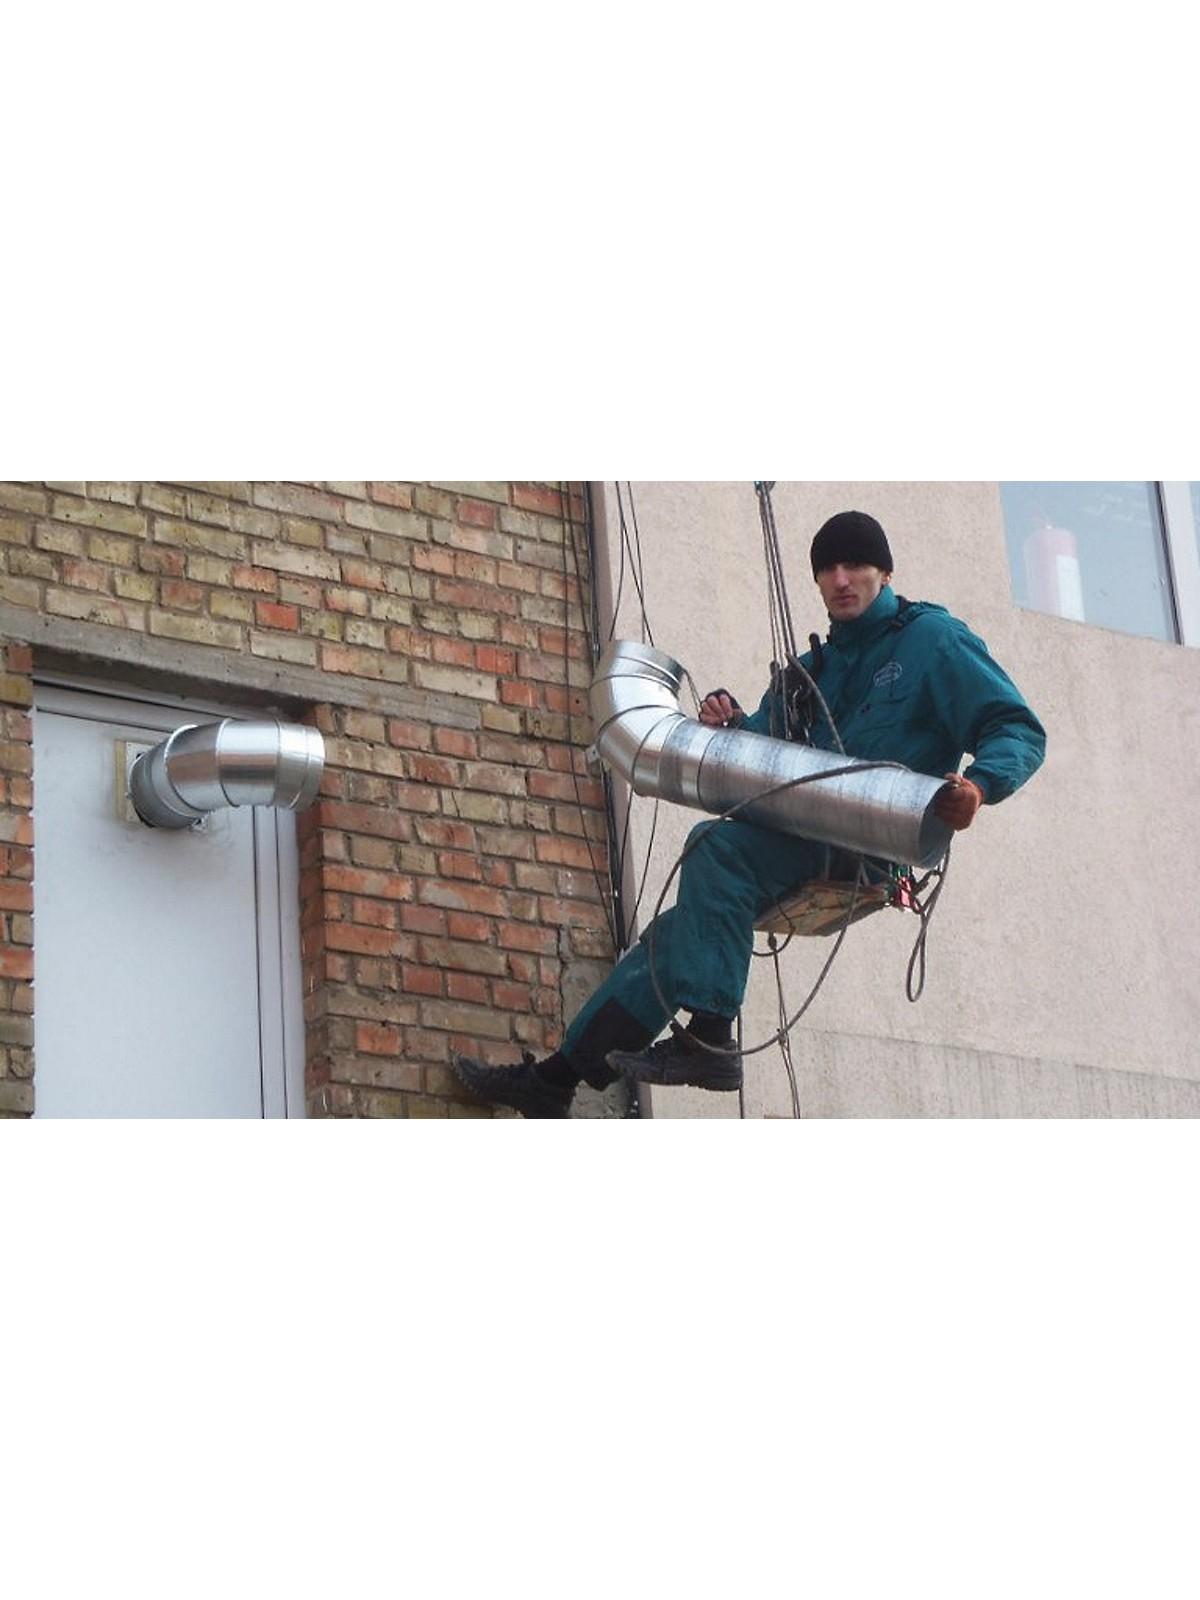 Работа альпиниста при монтаже систем вентиляции